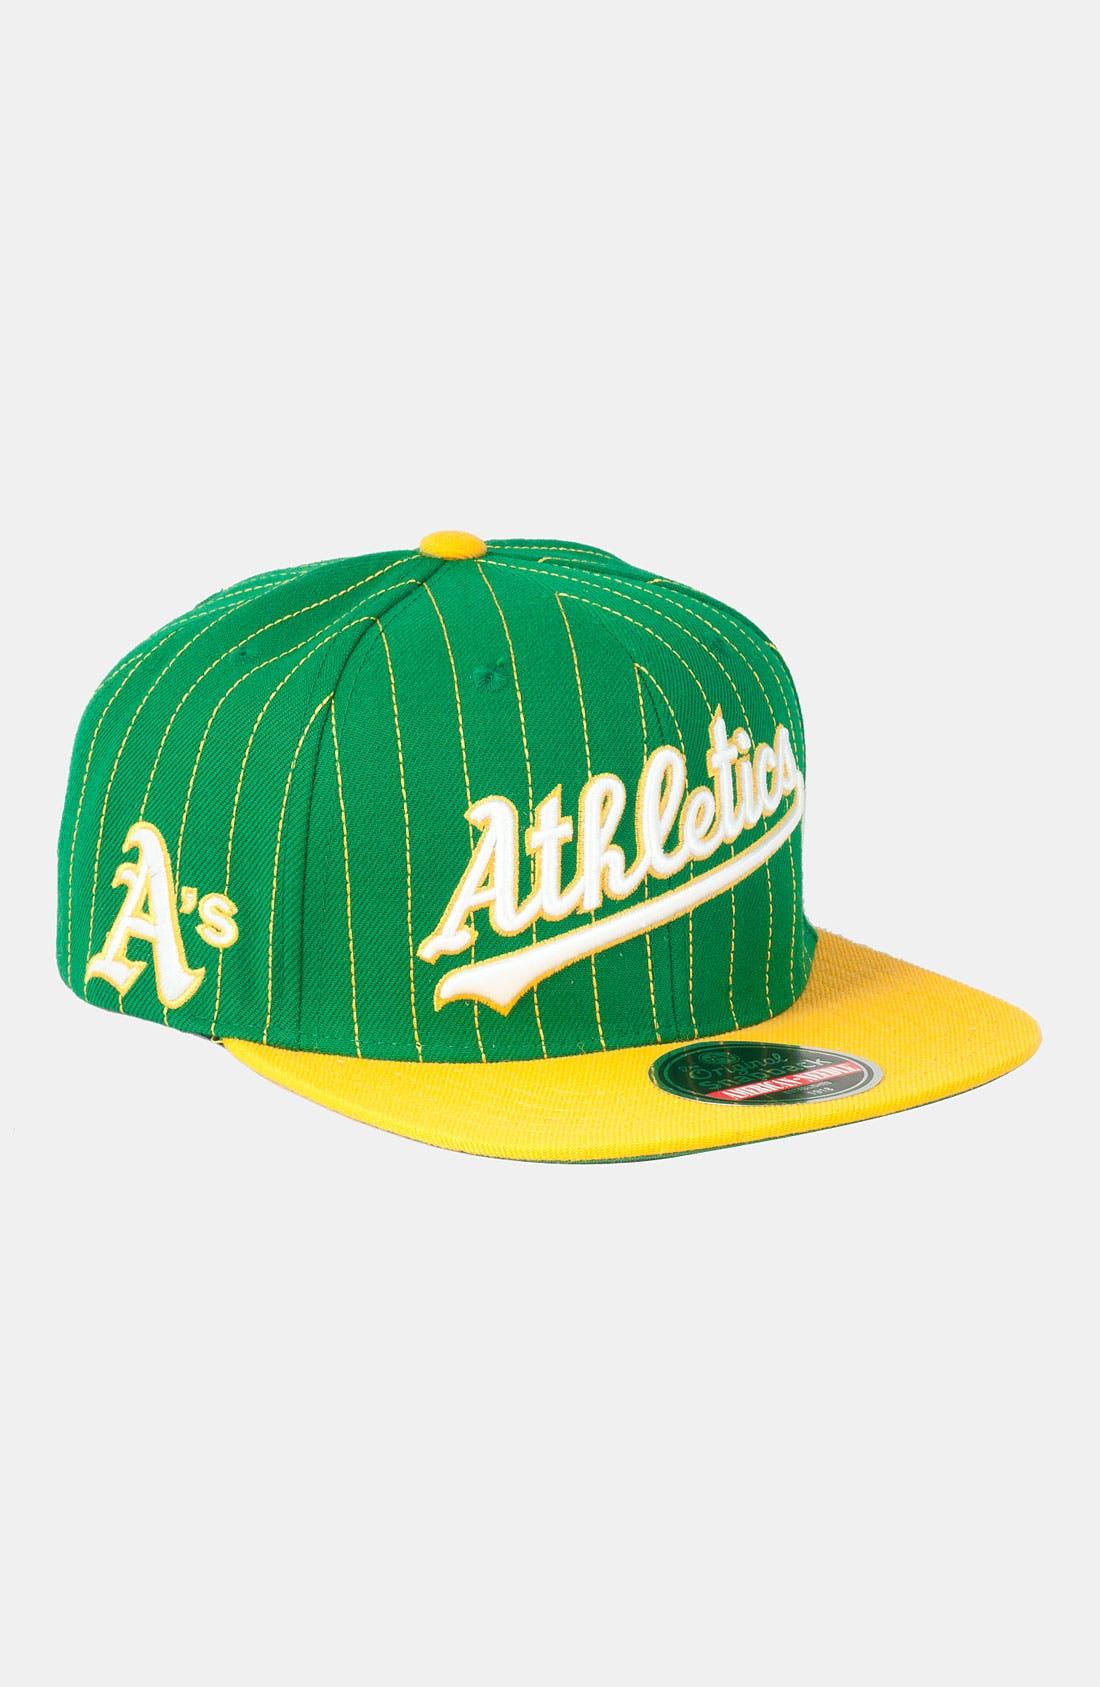 Main Image - American Needle 'Athletics' Snapback Baseball Cap